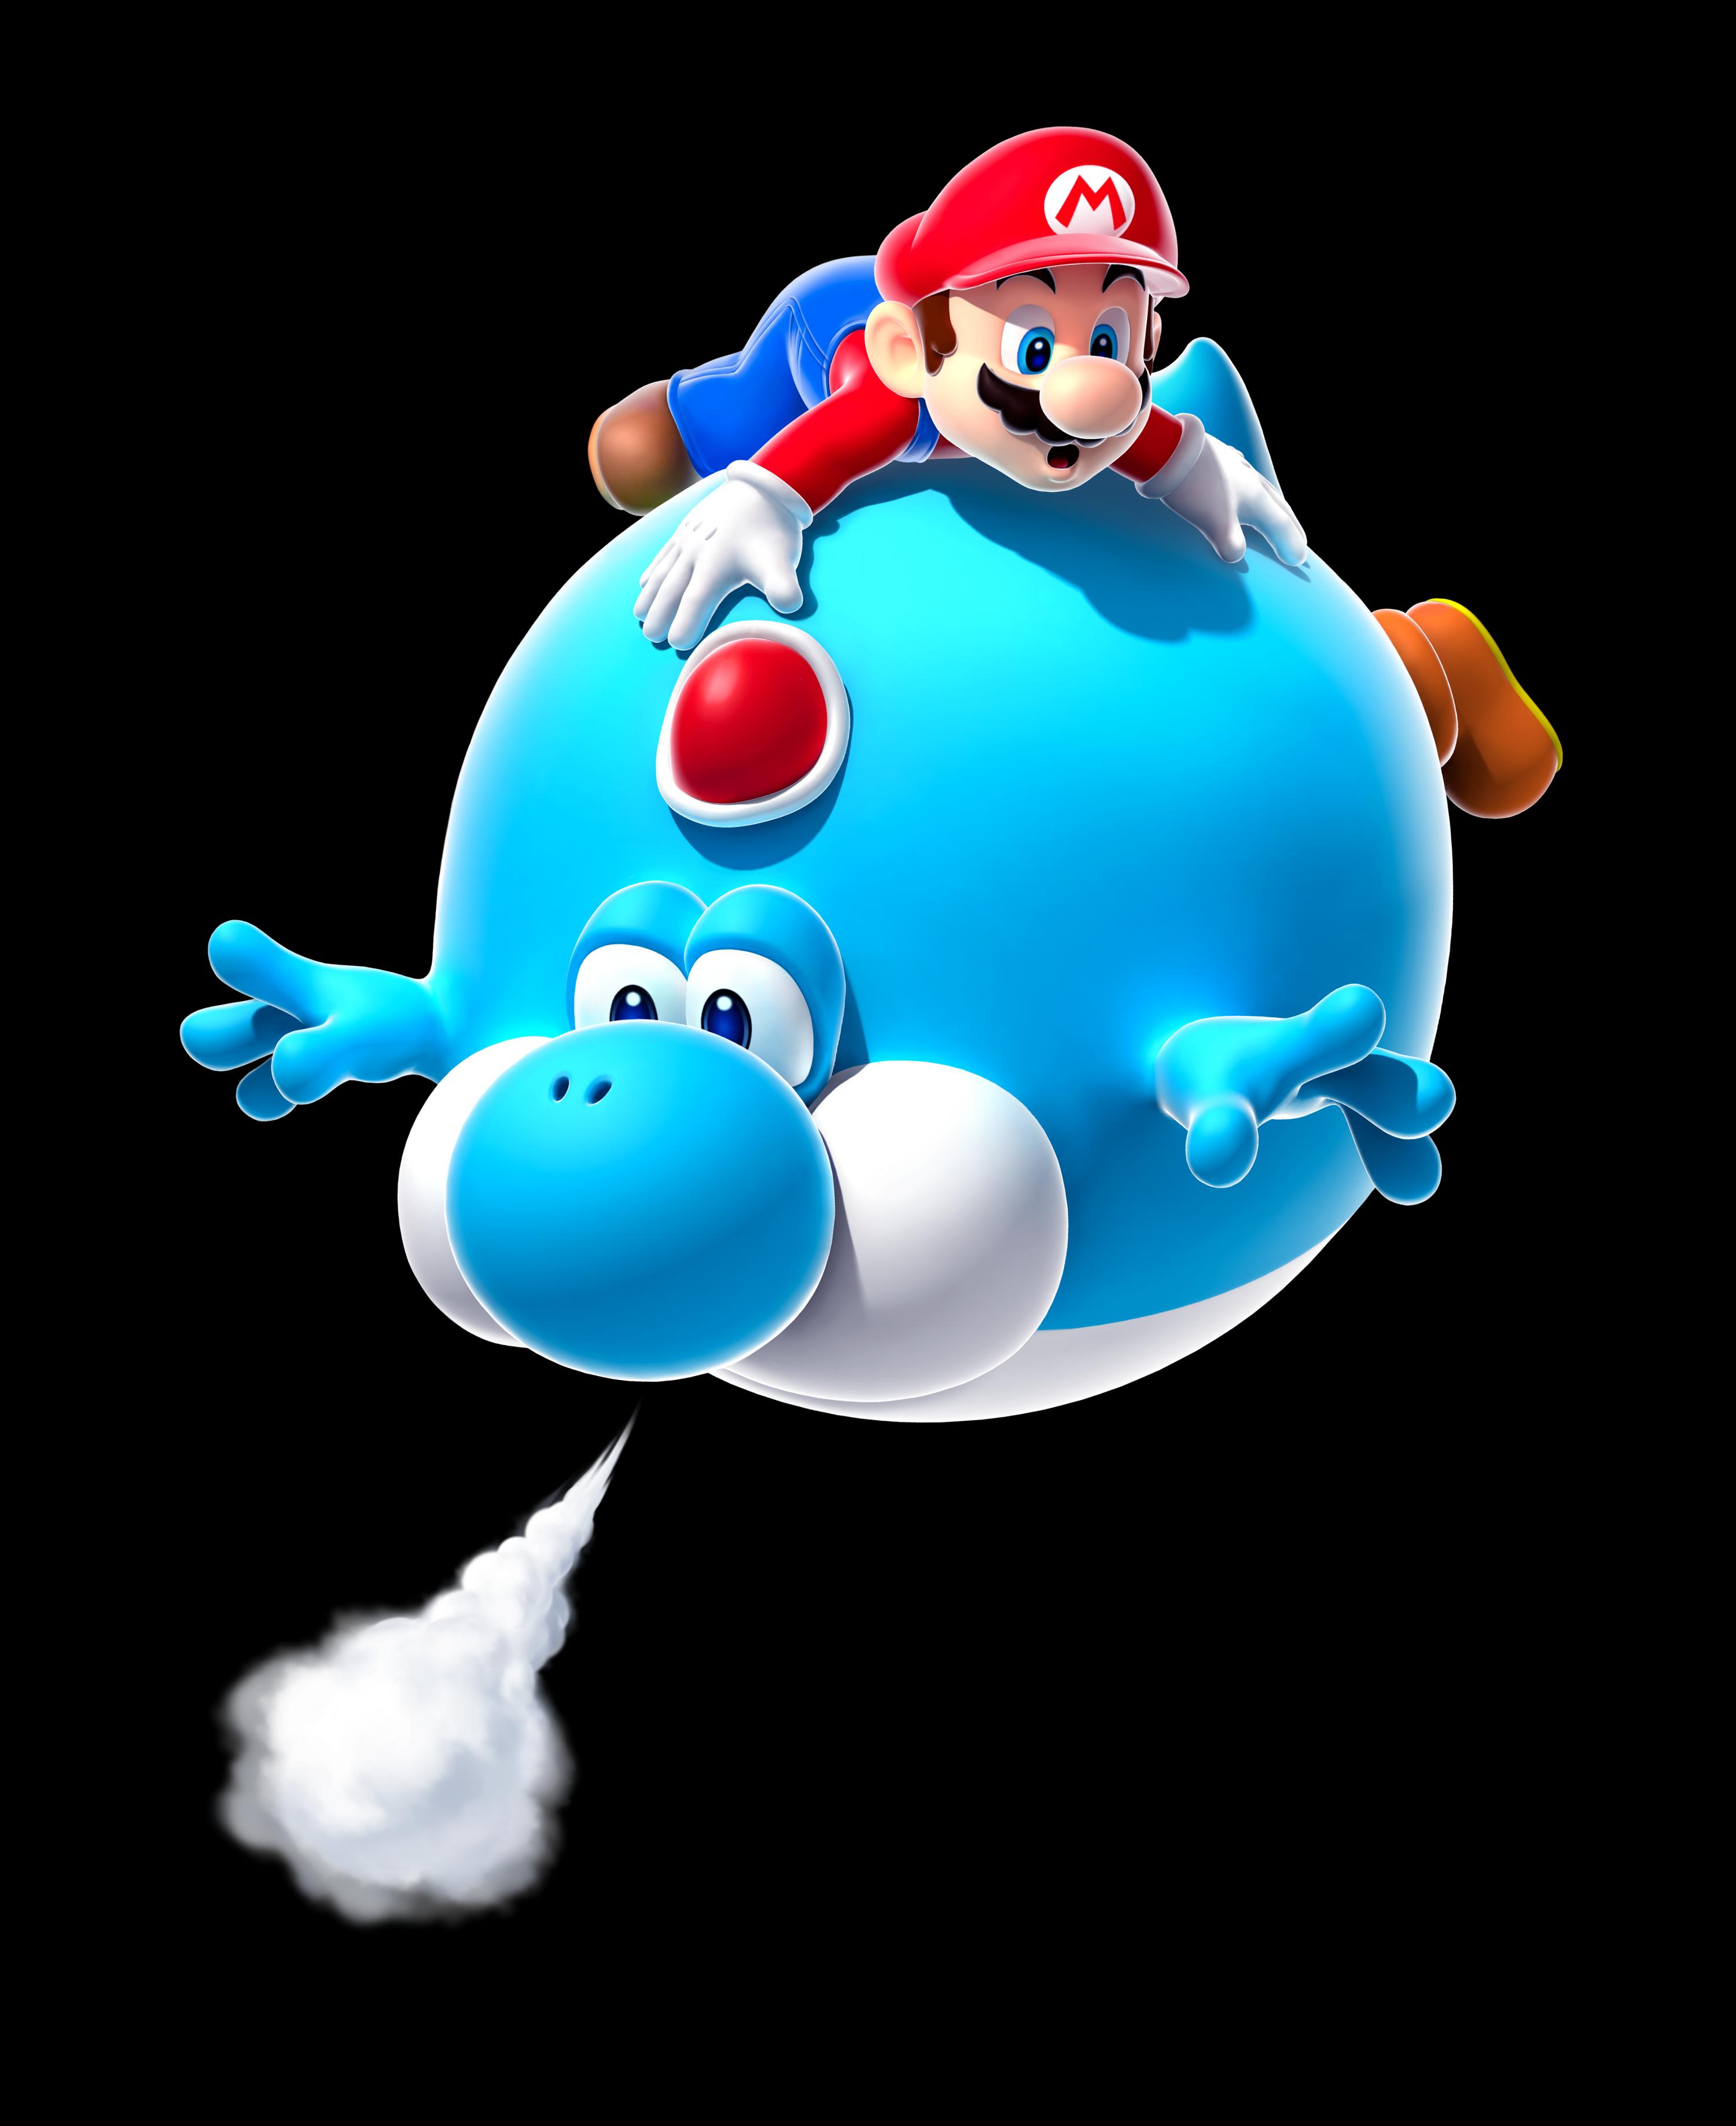 Mario and Blimp Yoshi